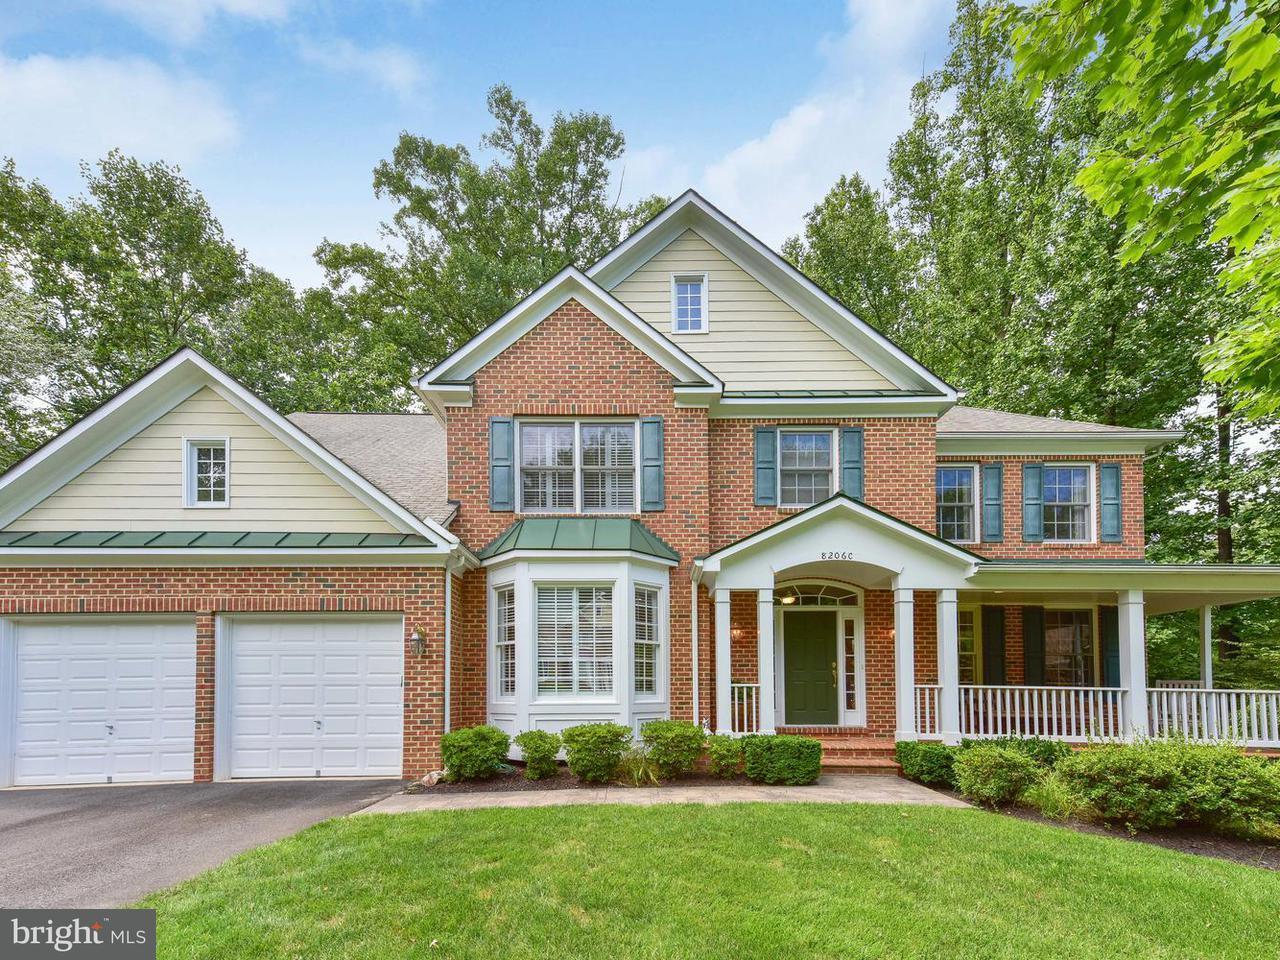 獨棟家庭住宅 為 出售 在 8206c Hillcrest Road 8206c Hillcrest Road Annandale, 弗吉尼亞州 22003 美國